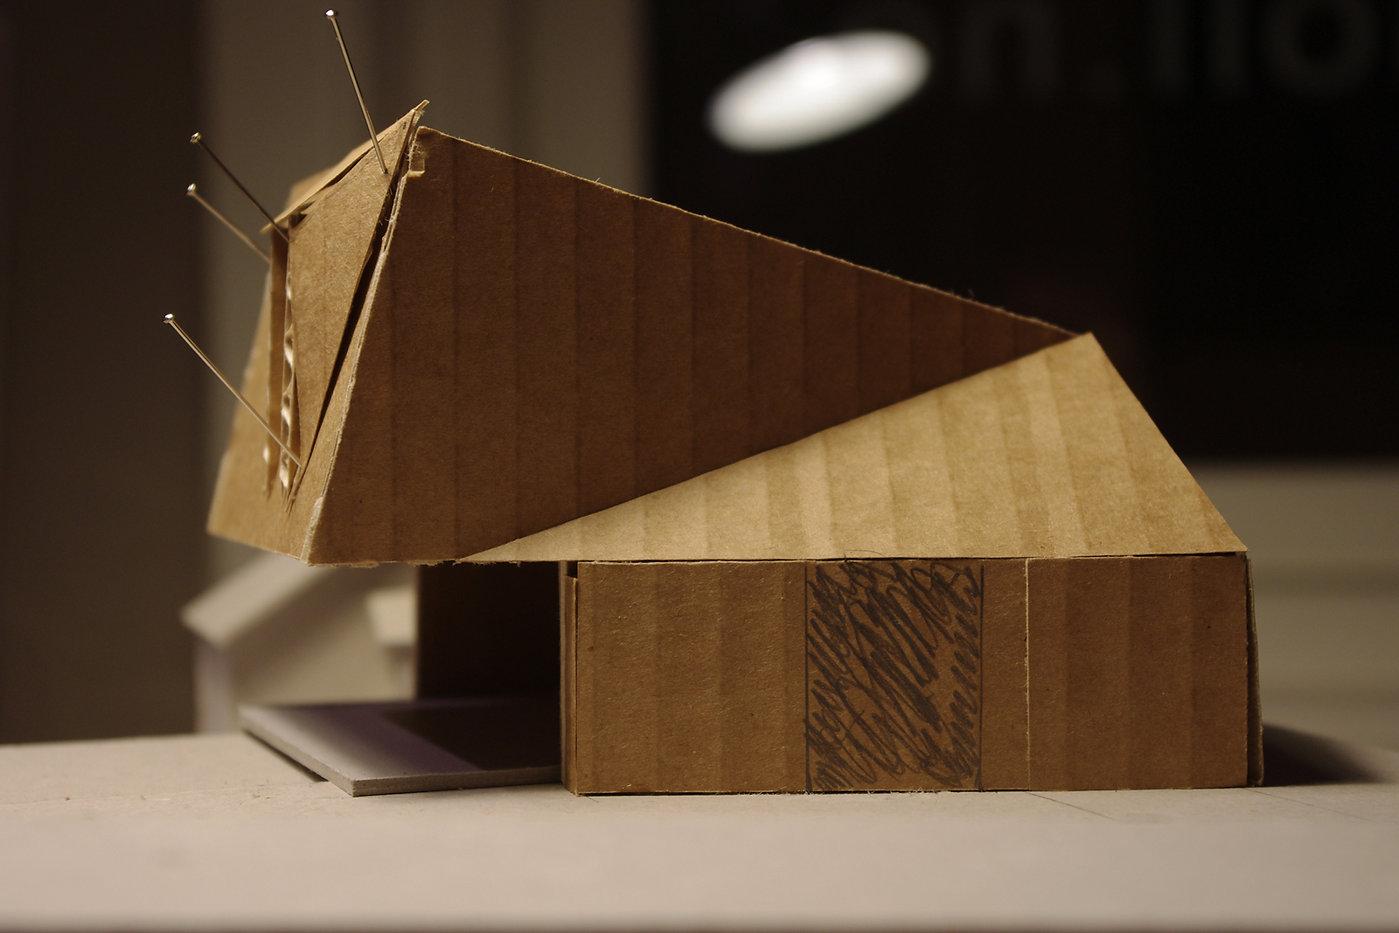 moll mikal christos hafsahl sivilarkitekt ntnu university sketch model architecture scultpture small house